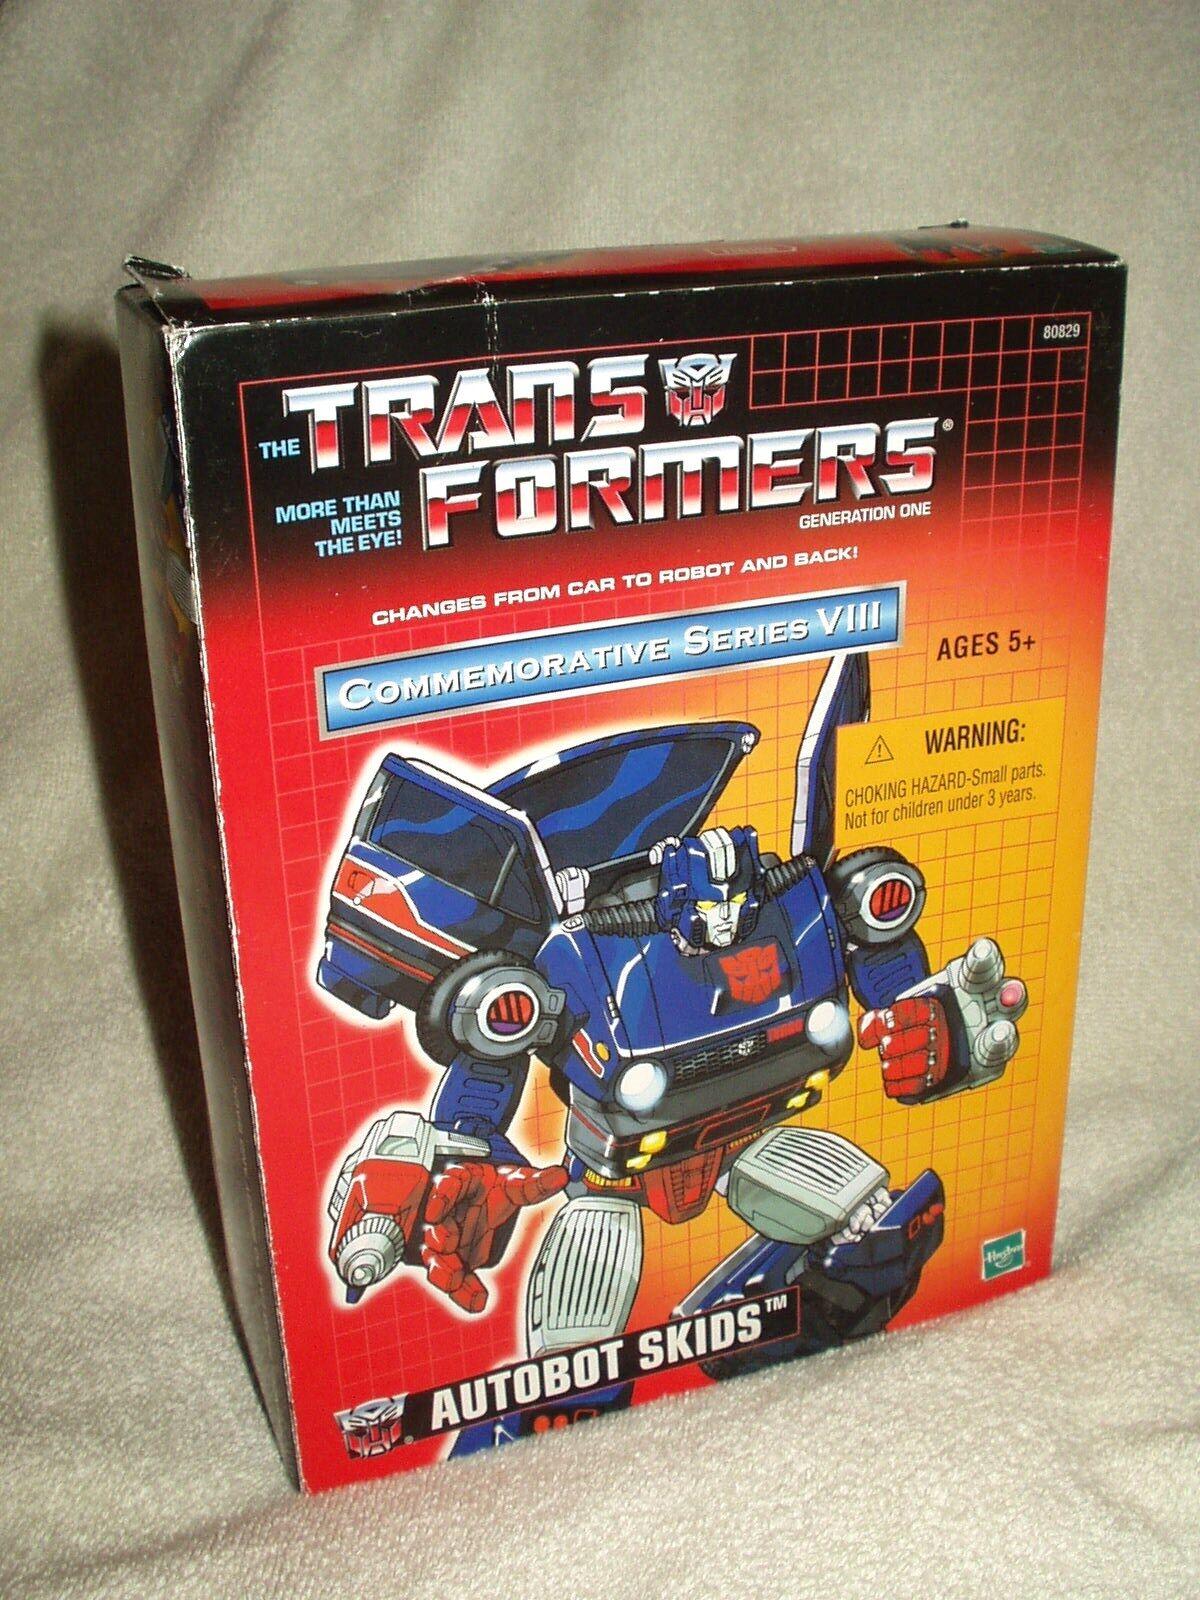 Figurine transformers takara réédition commémorative Série VIII patins